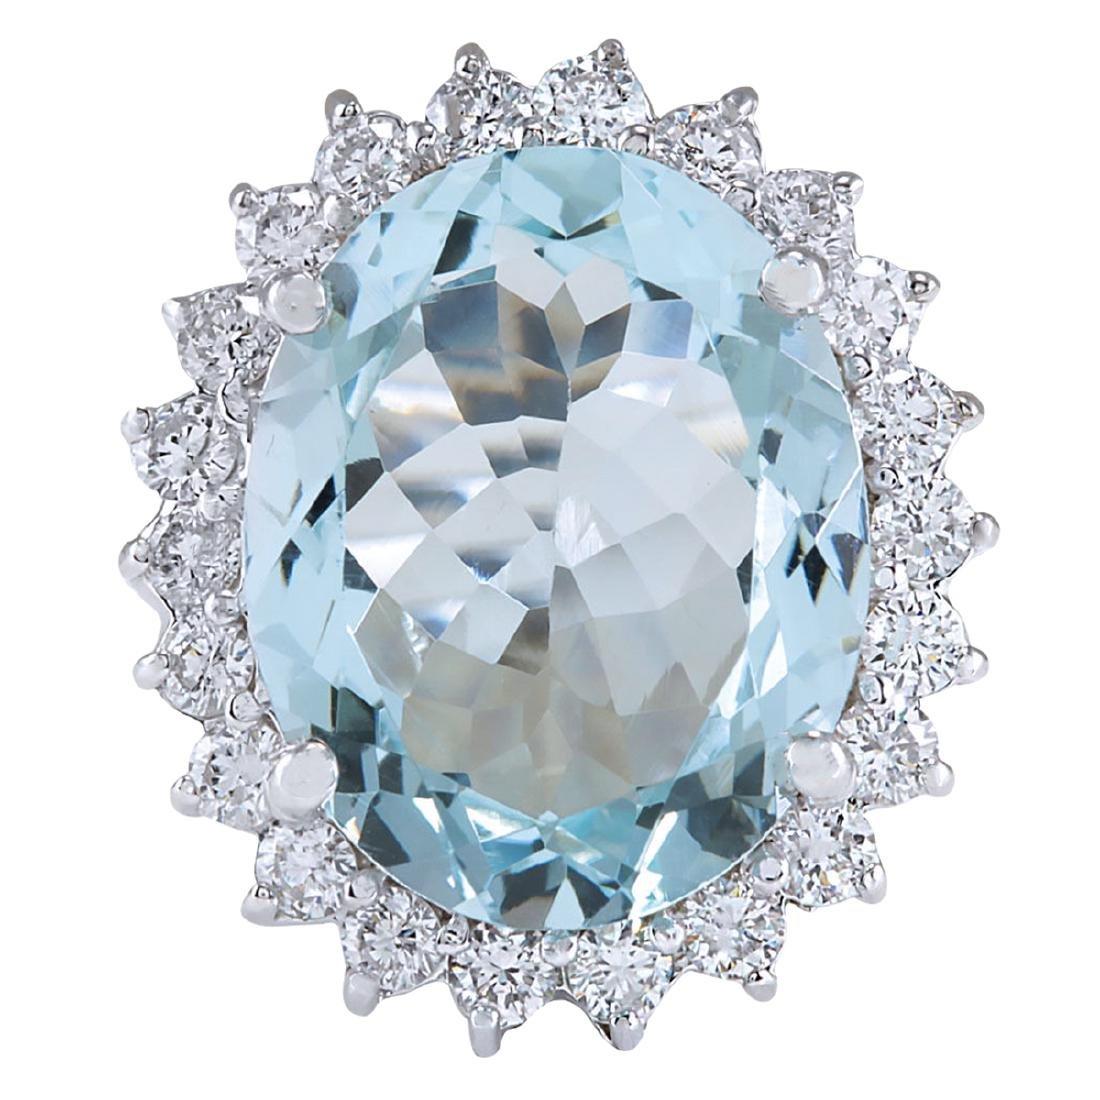 8.91CTW Natural Aquamarine And Diamond Ring In 18K